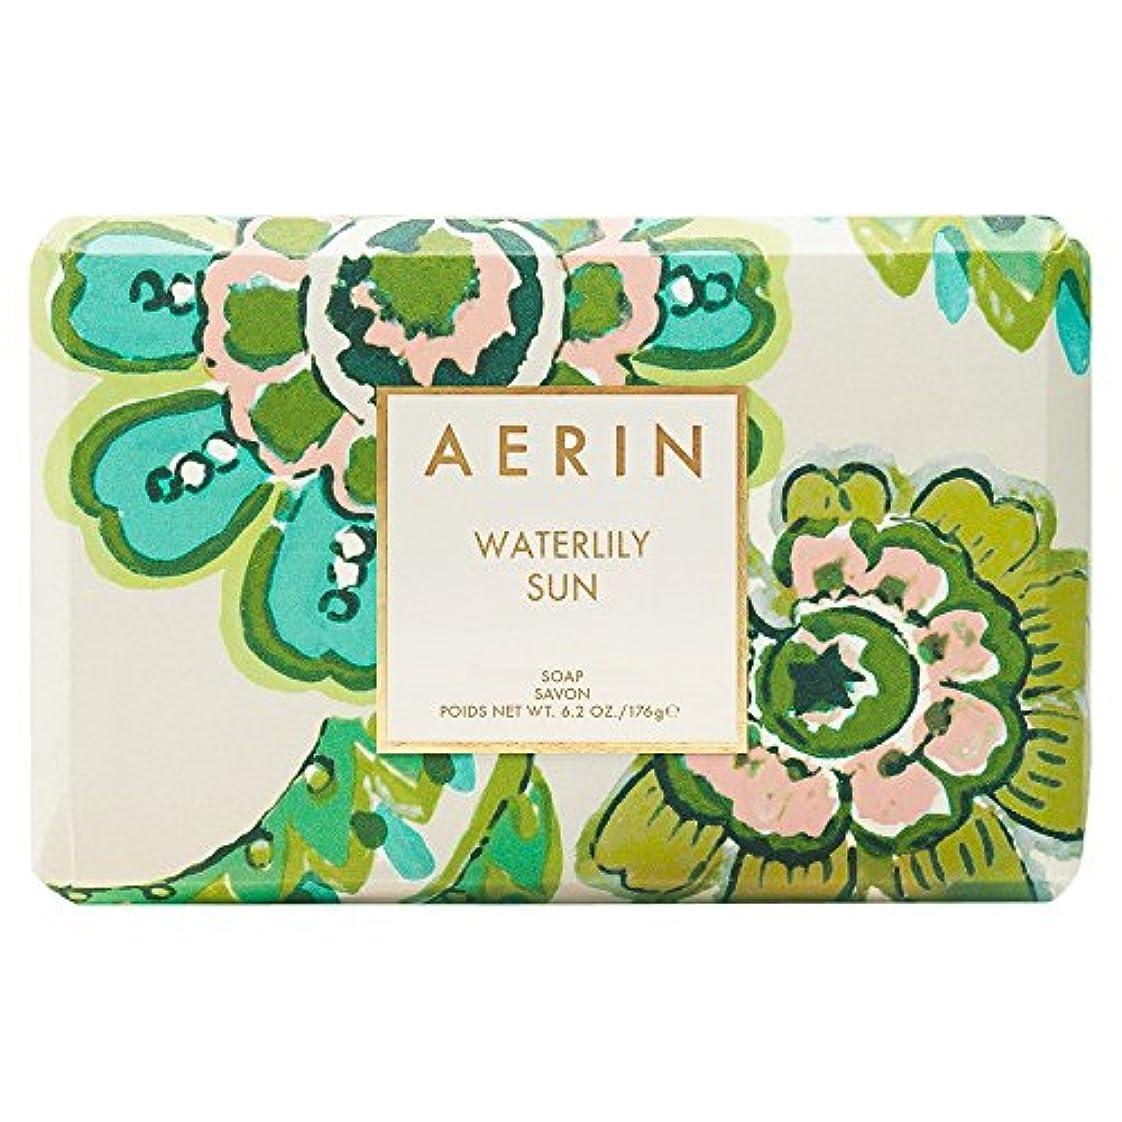 Aerinスイレン日石鹸176グラム (AERIN) - AERIN Waterlily Sun Soap 176g [並行輸入品]